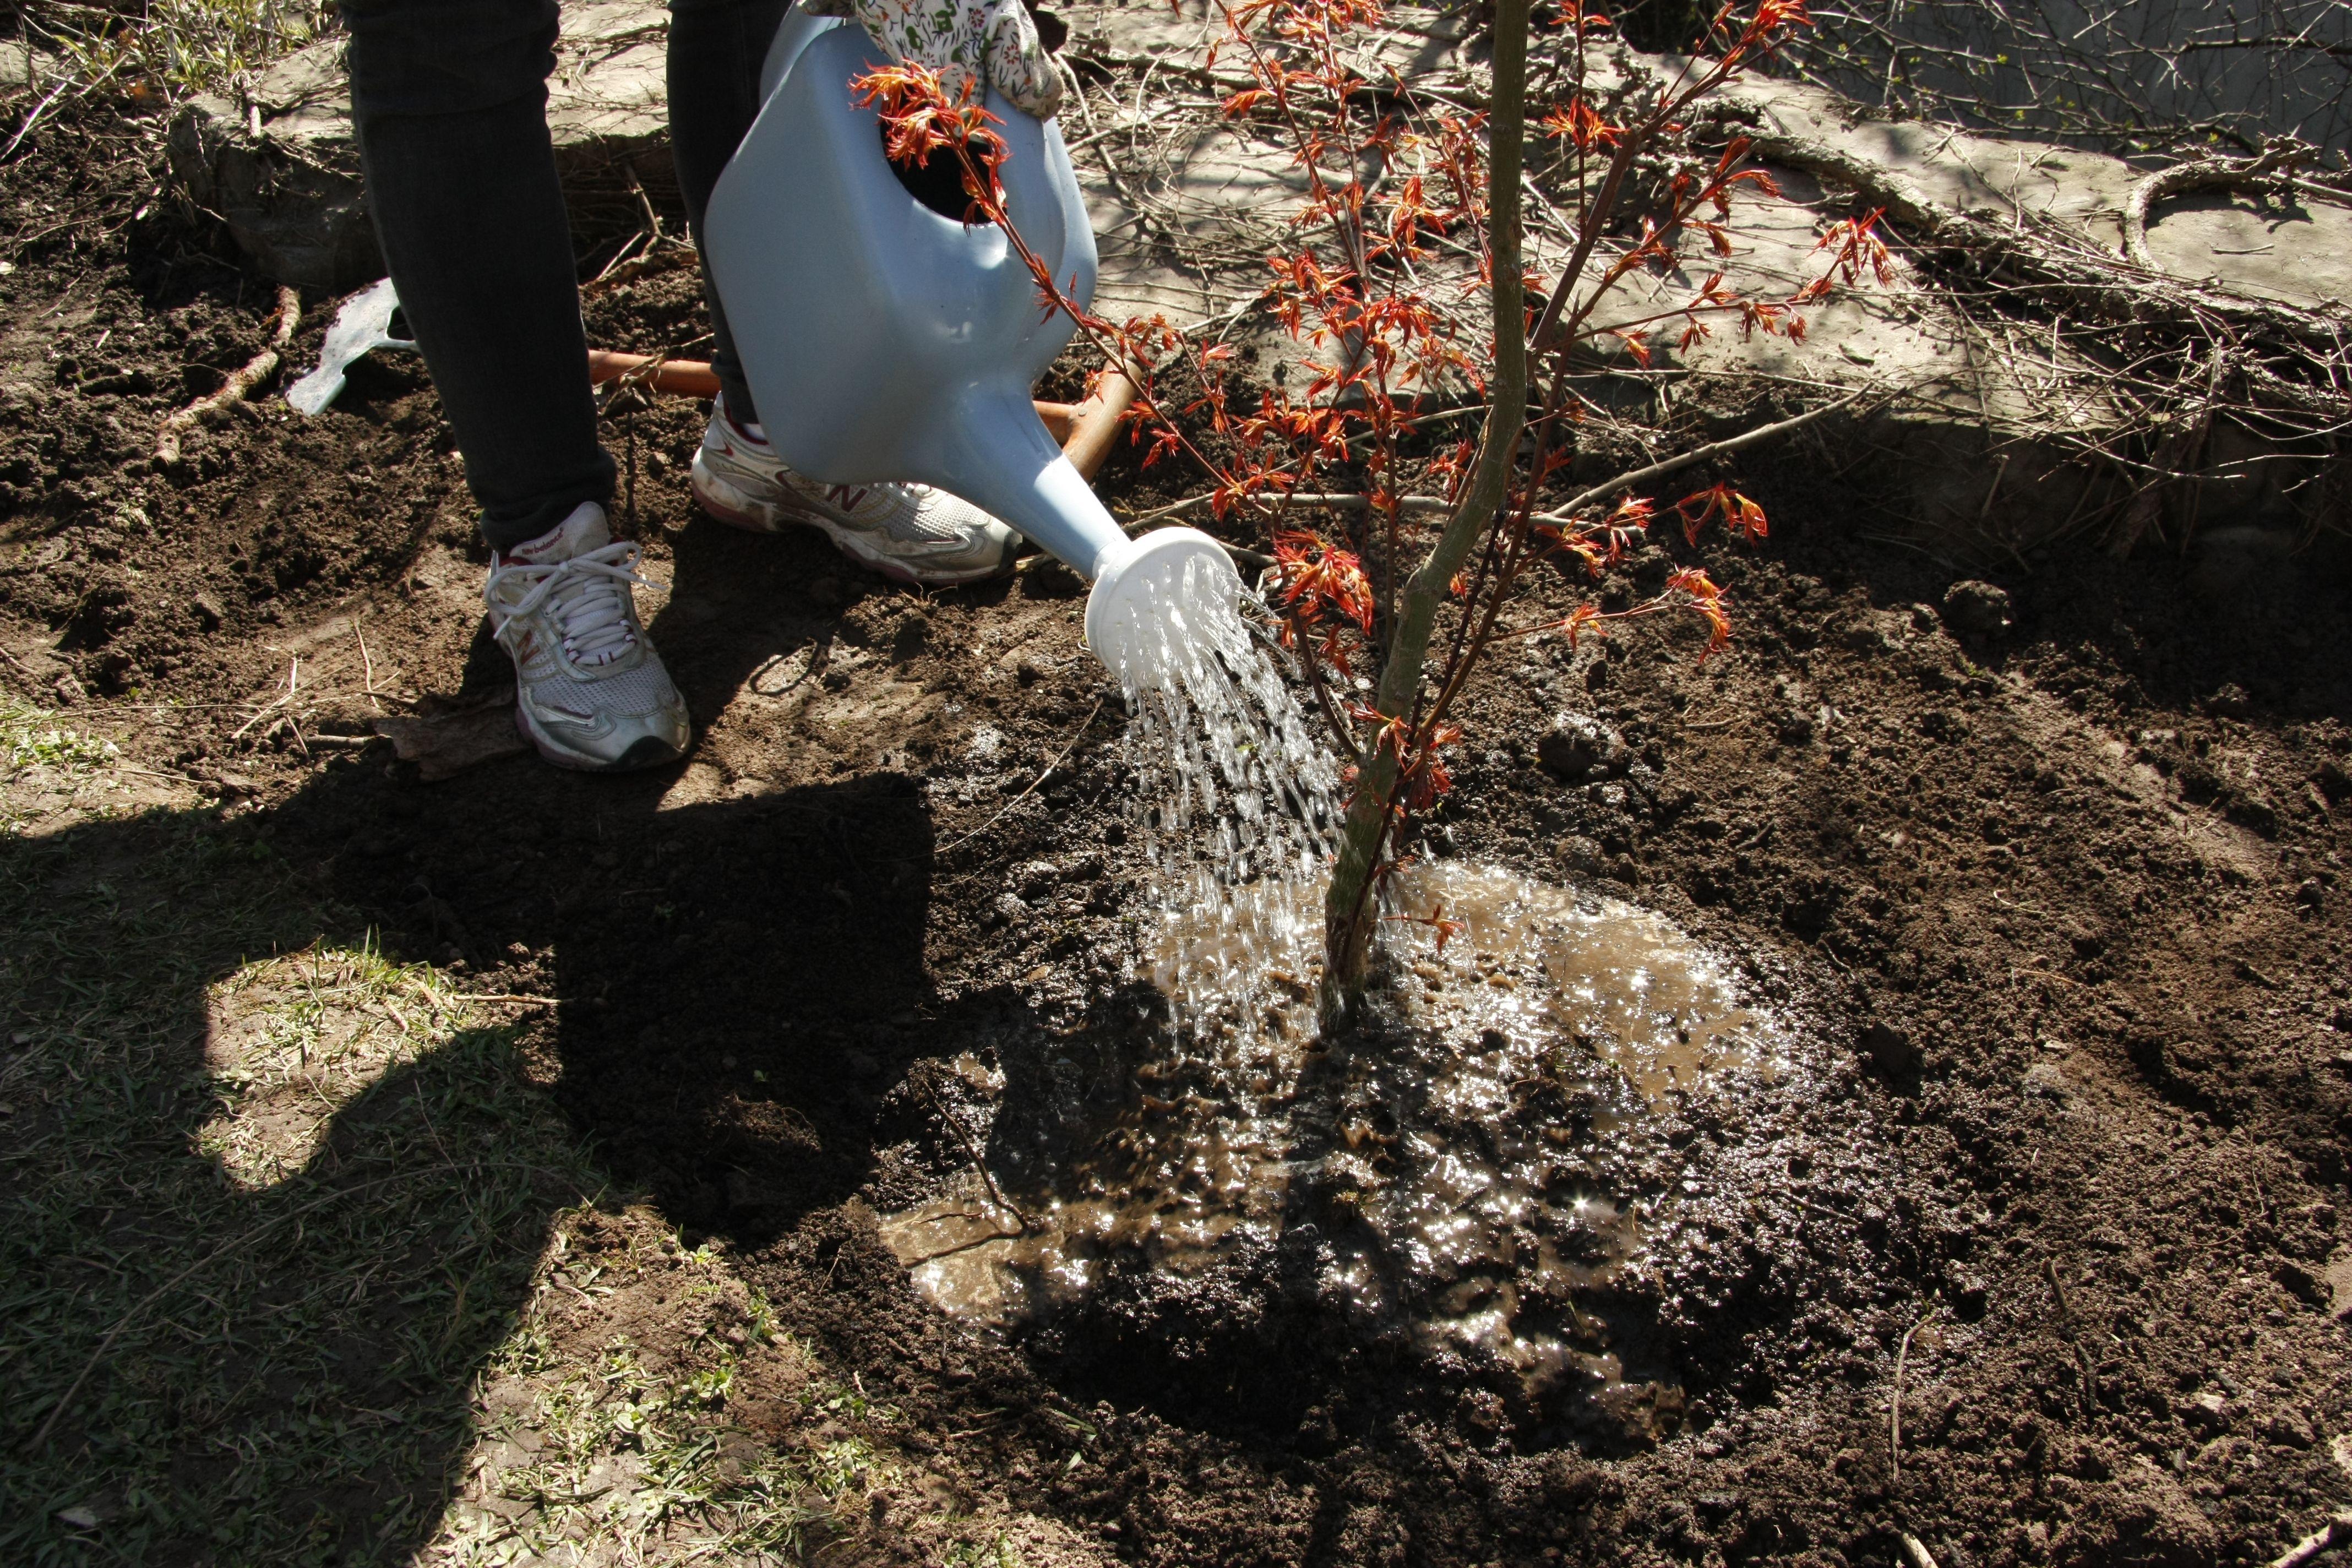 trees gotta drink too!   #BWtreeplant #earthday2013